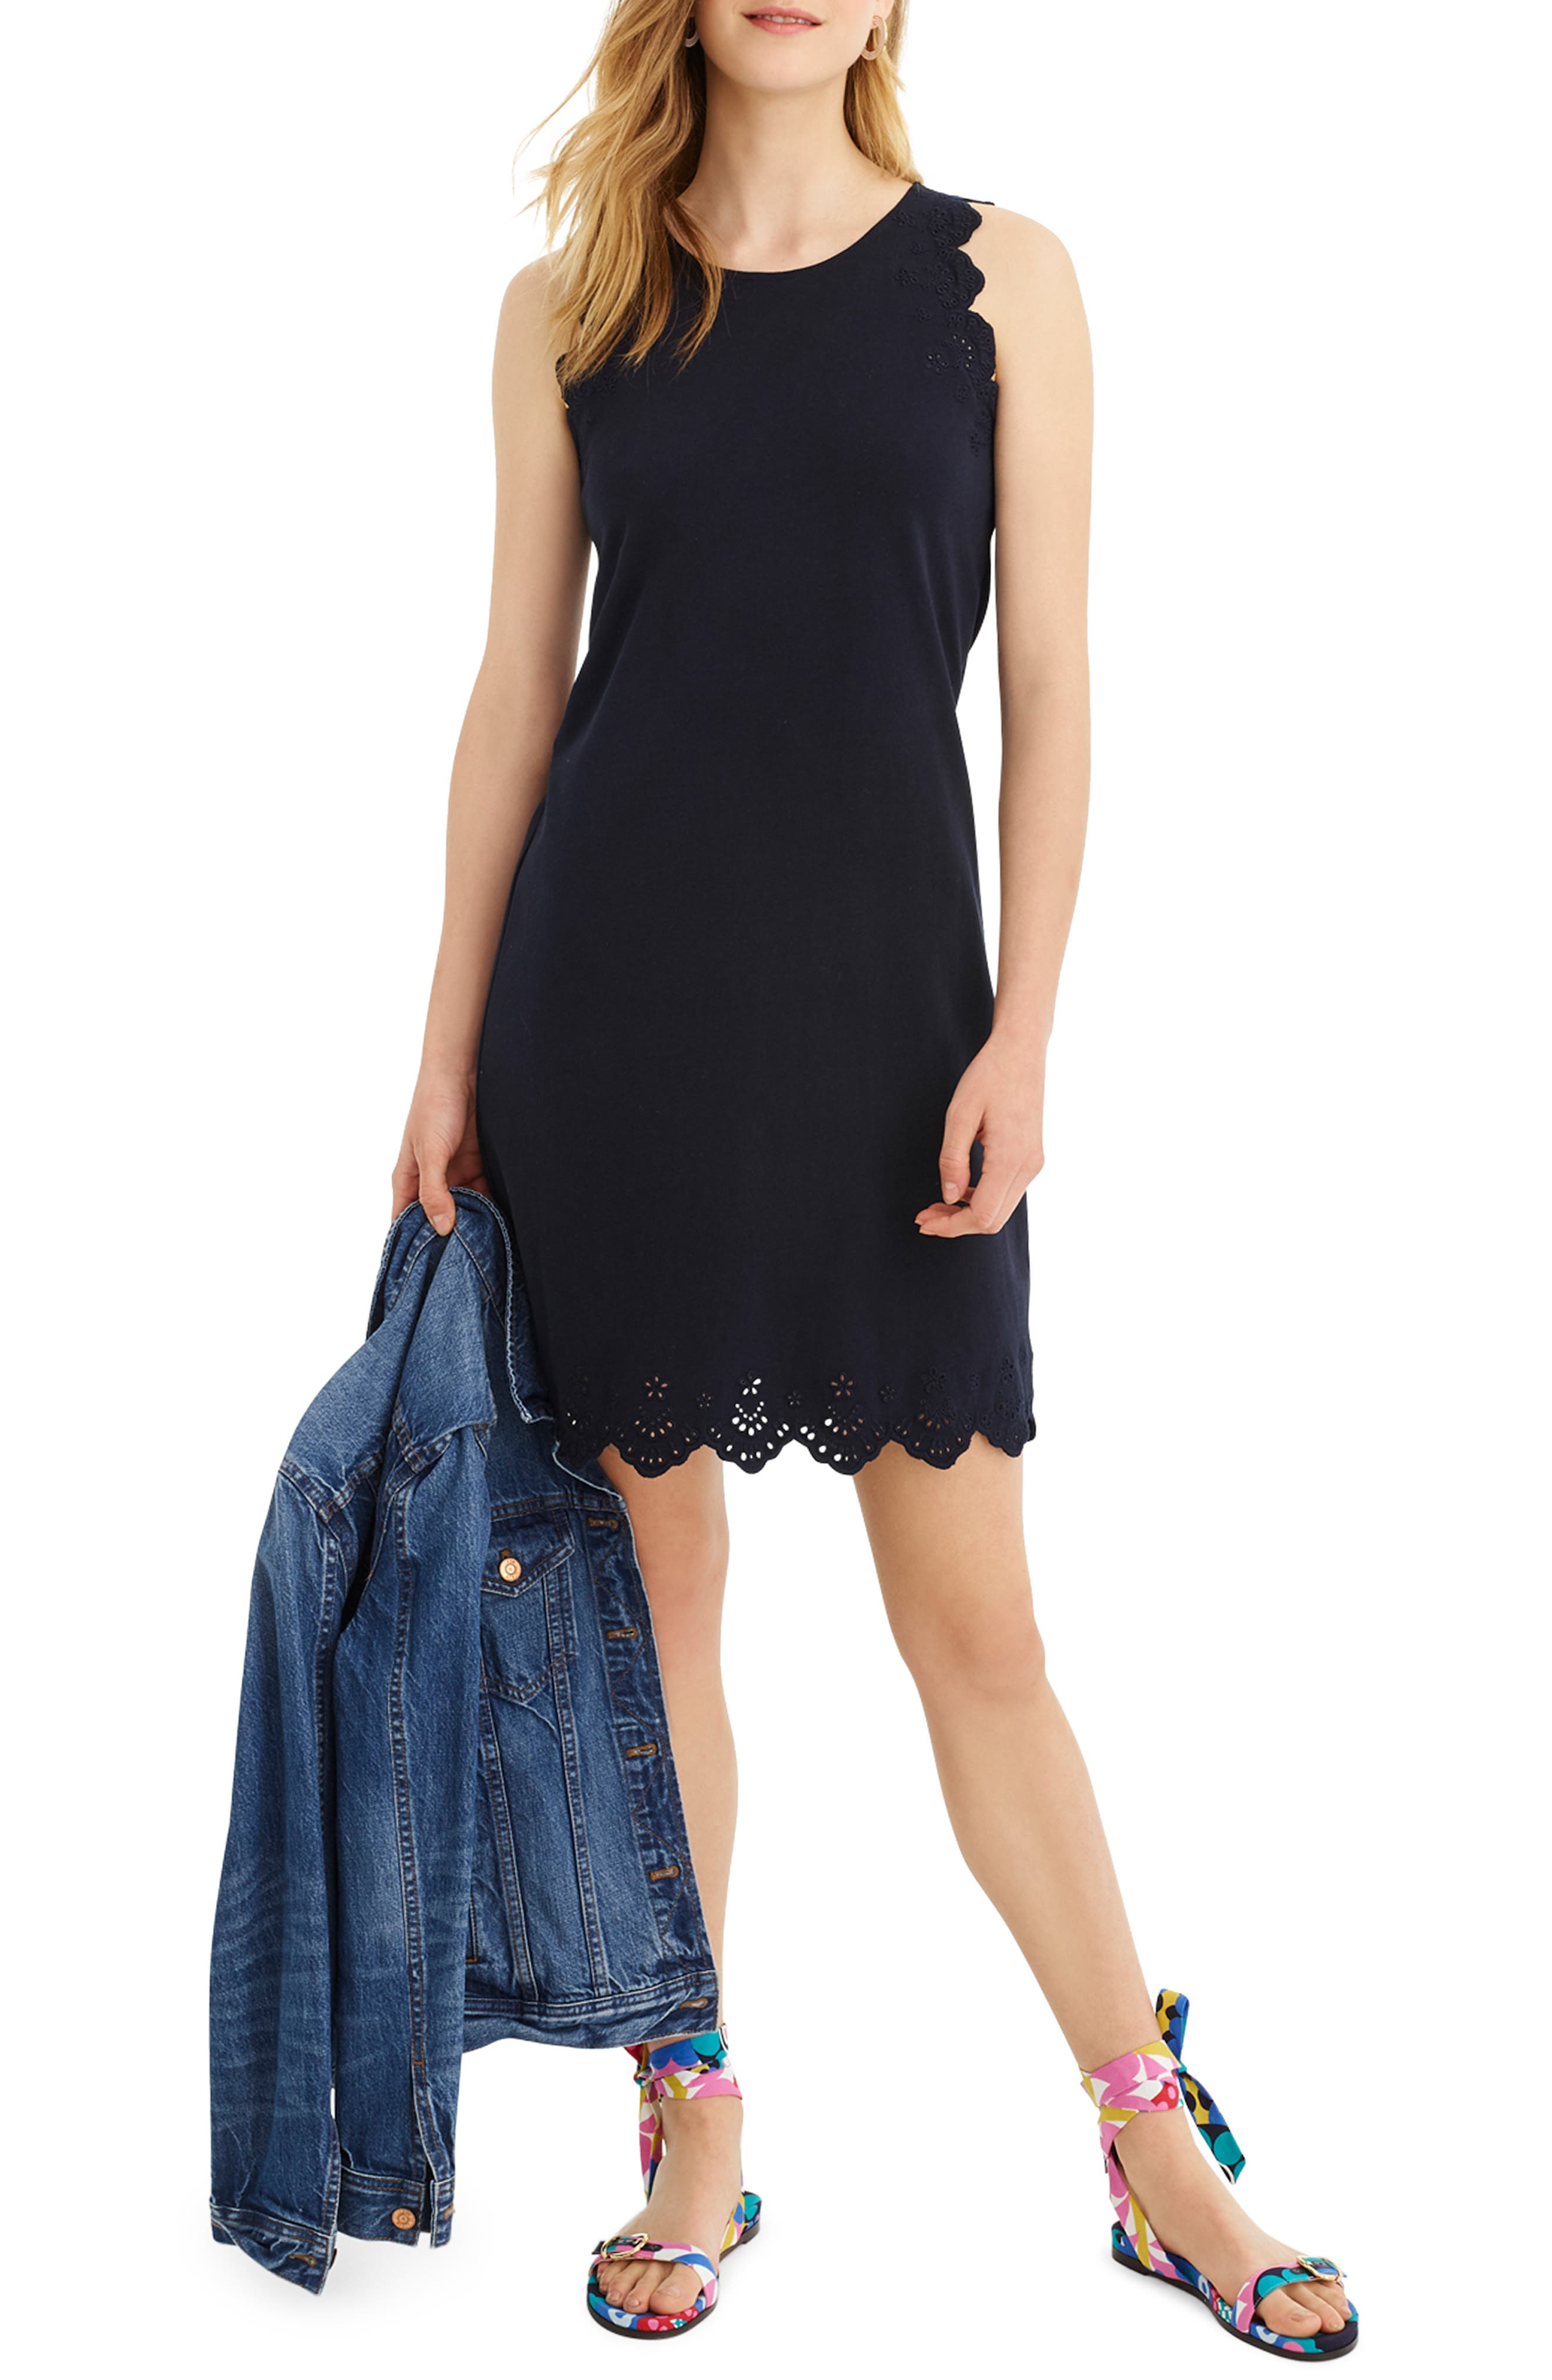 J.crew Eyelet Trim Sleeveless Knit Dress, Blue